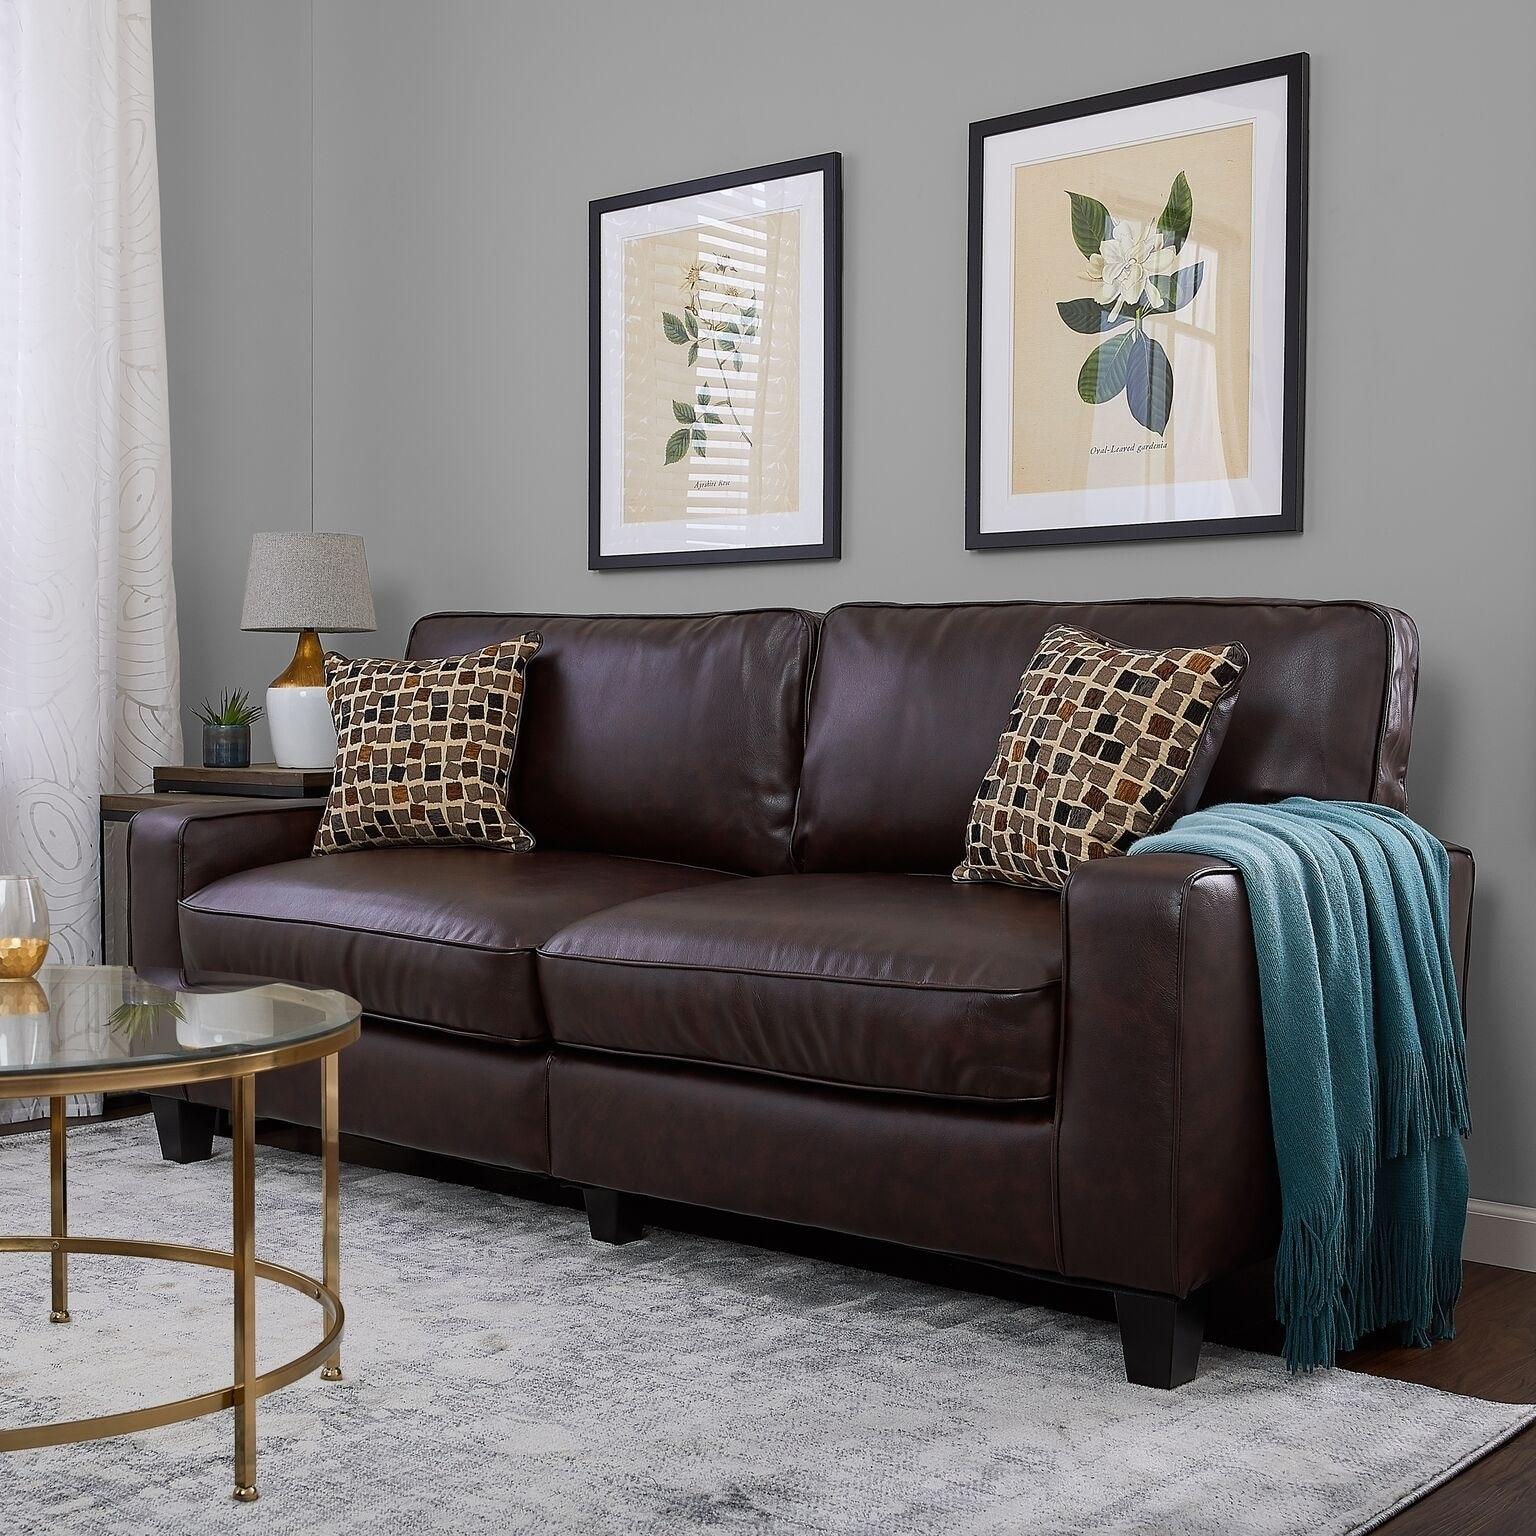 Serta Monaco Collection 77-inch Brown Leather Sofa